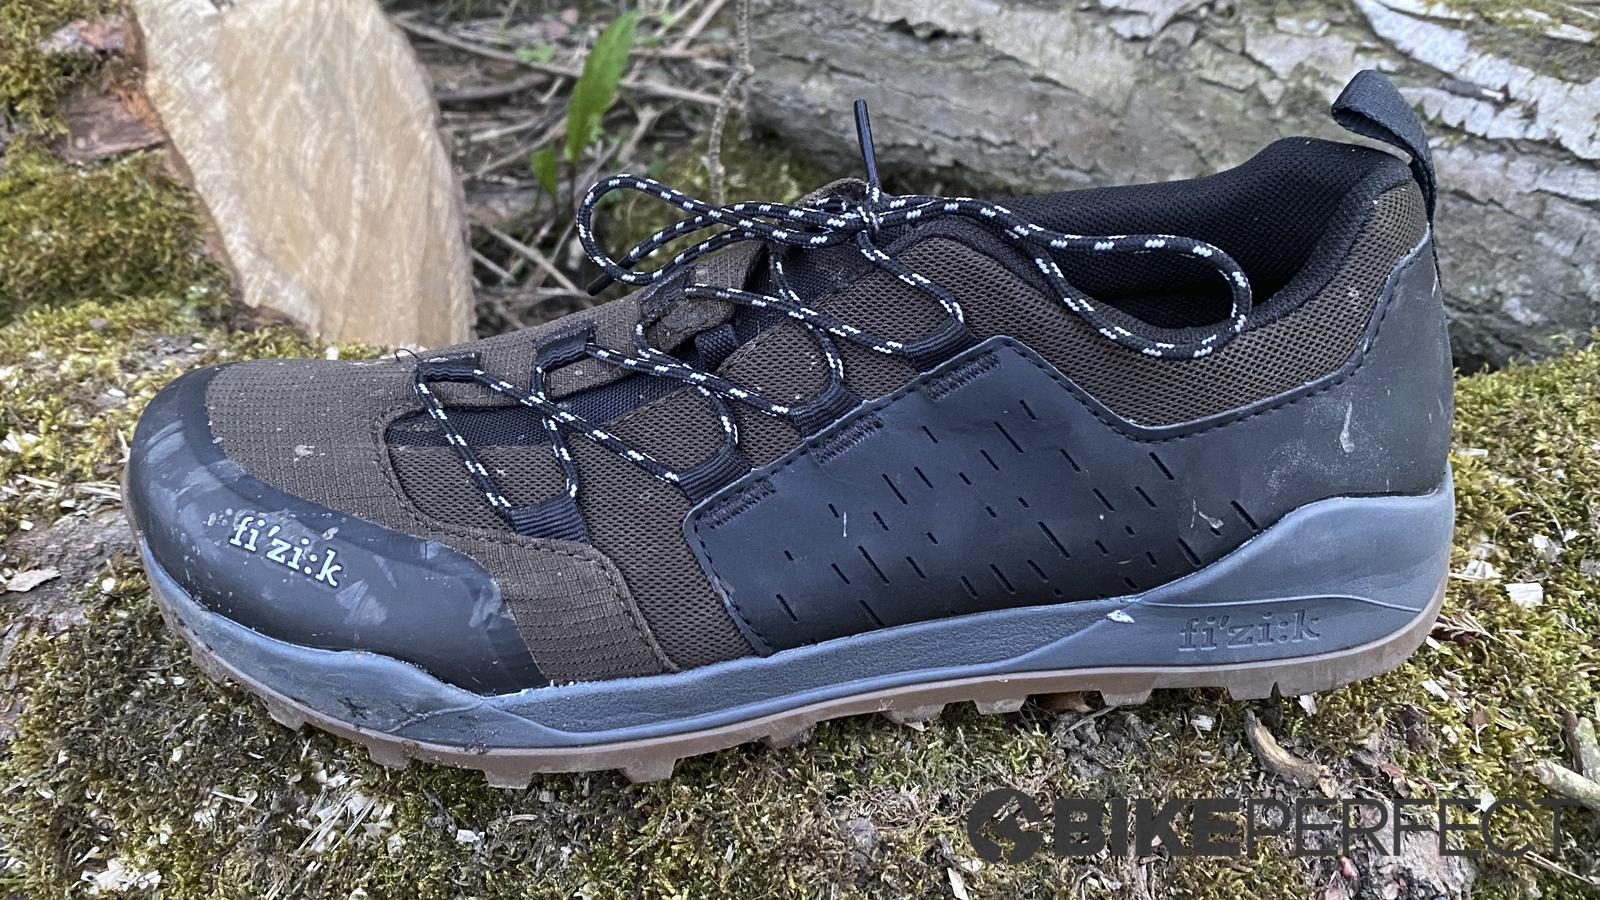 Fizik X2 Terra Ergolace trail shoe review